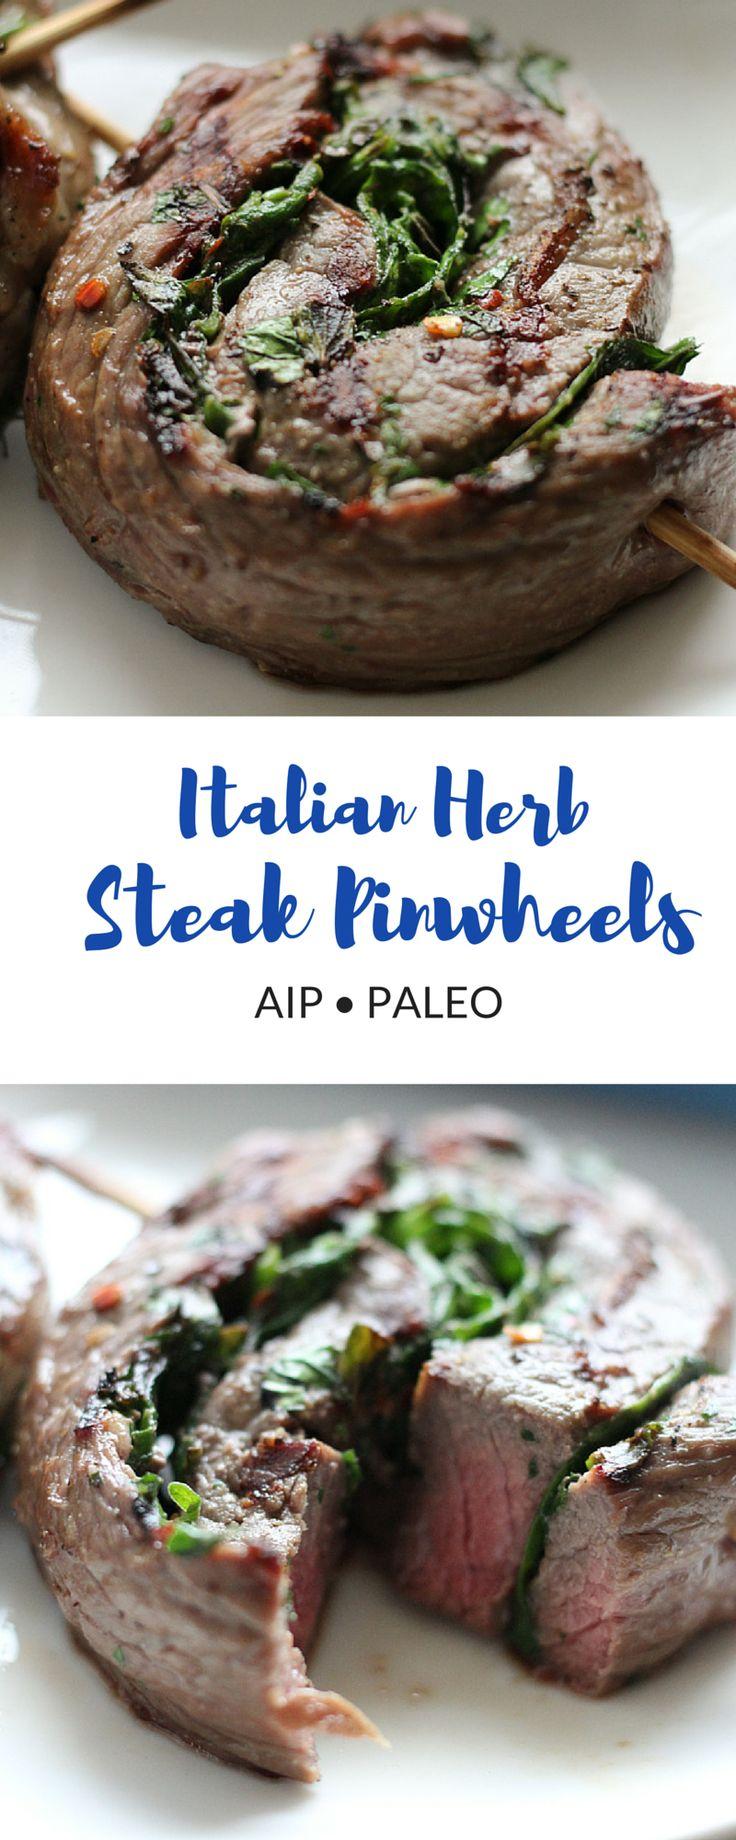 Italian Herb Steak Pinwheel (AIP, Paleo)